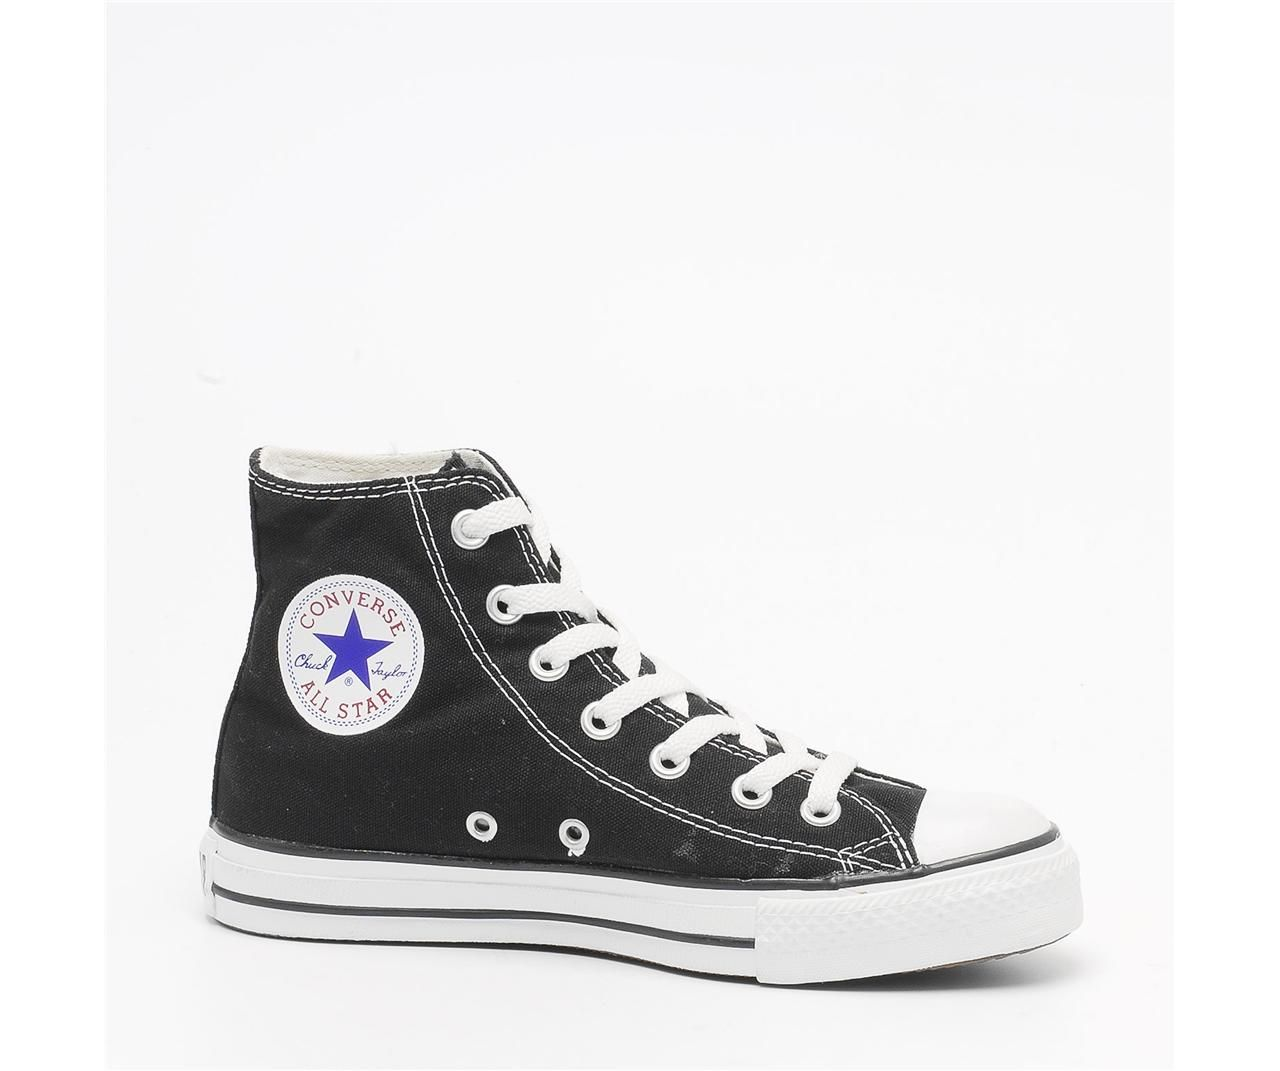 Converse Limited Edition | Schoenen Schoenen, Straatmode